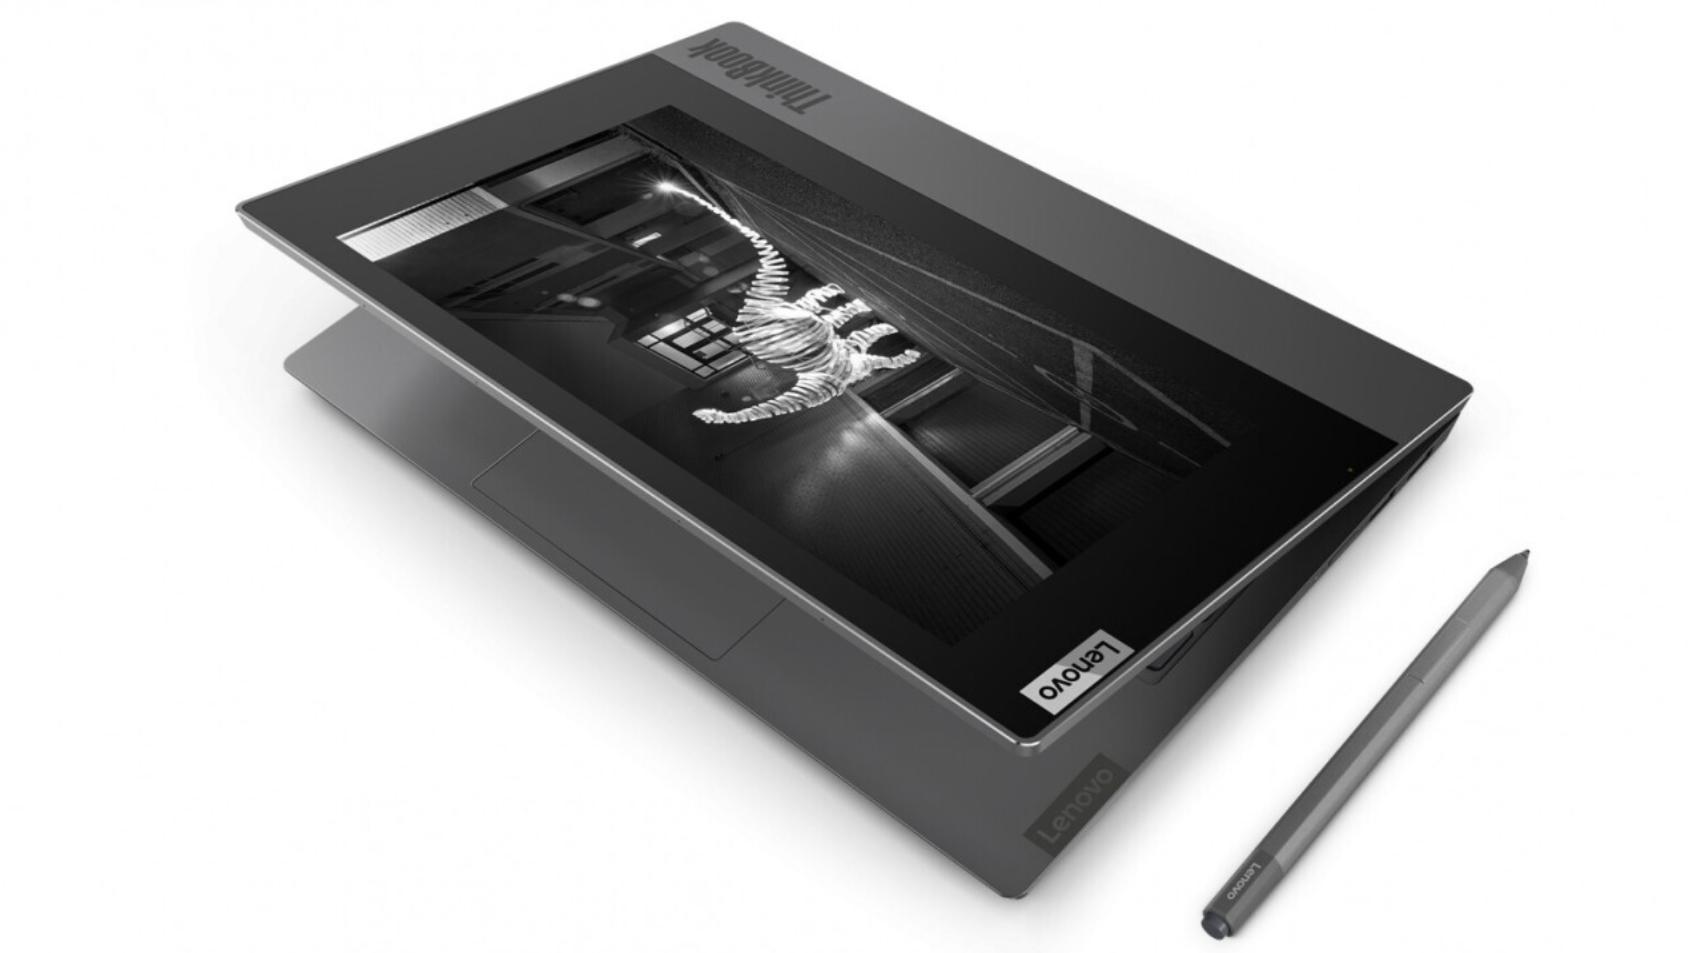 Lenovo představilo notebook ThinkBook Plus s e-ink displejem [CES]